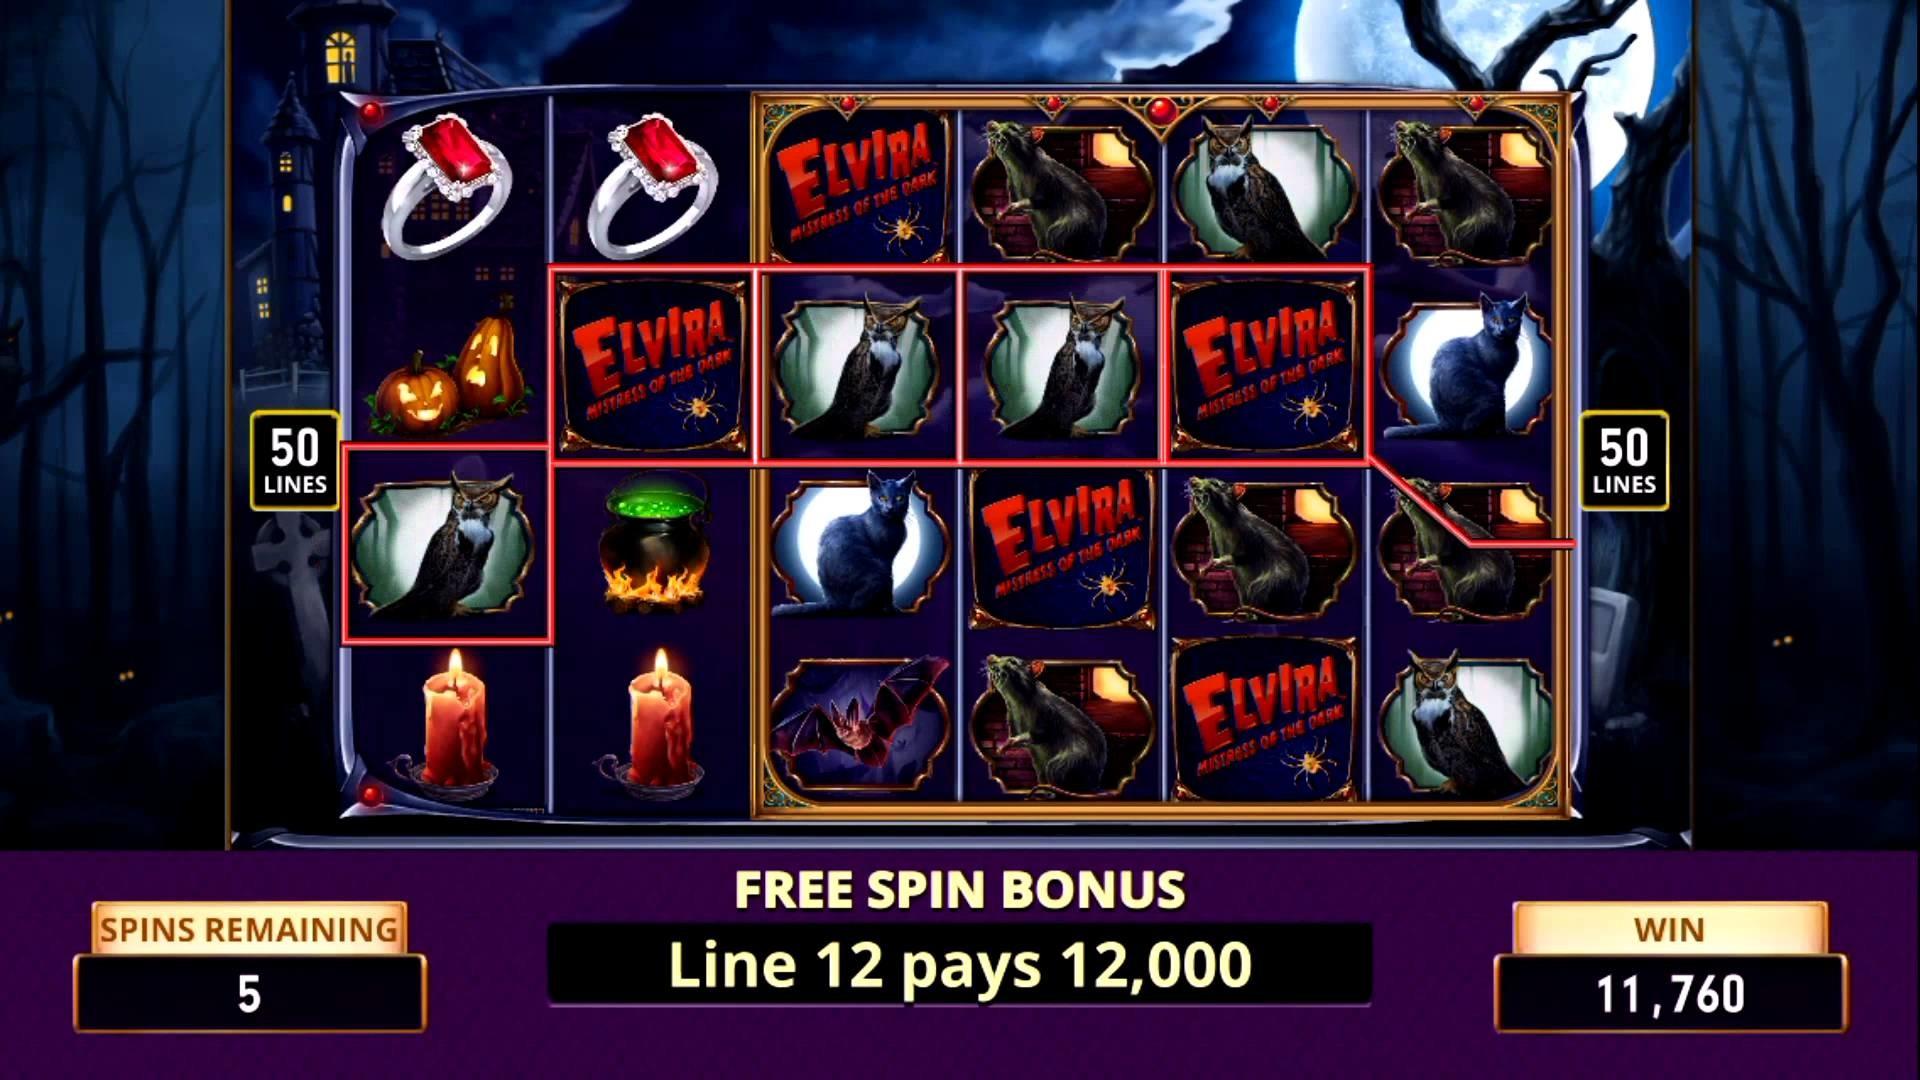 ELVIRA MISTRESS OF THE DARK Video Slot Machine Game with an ELVIRA FREE  SPIN BONUS